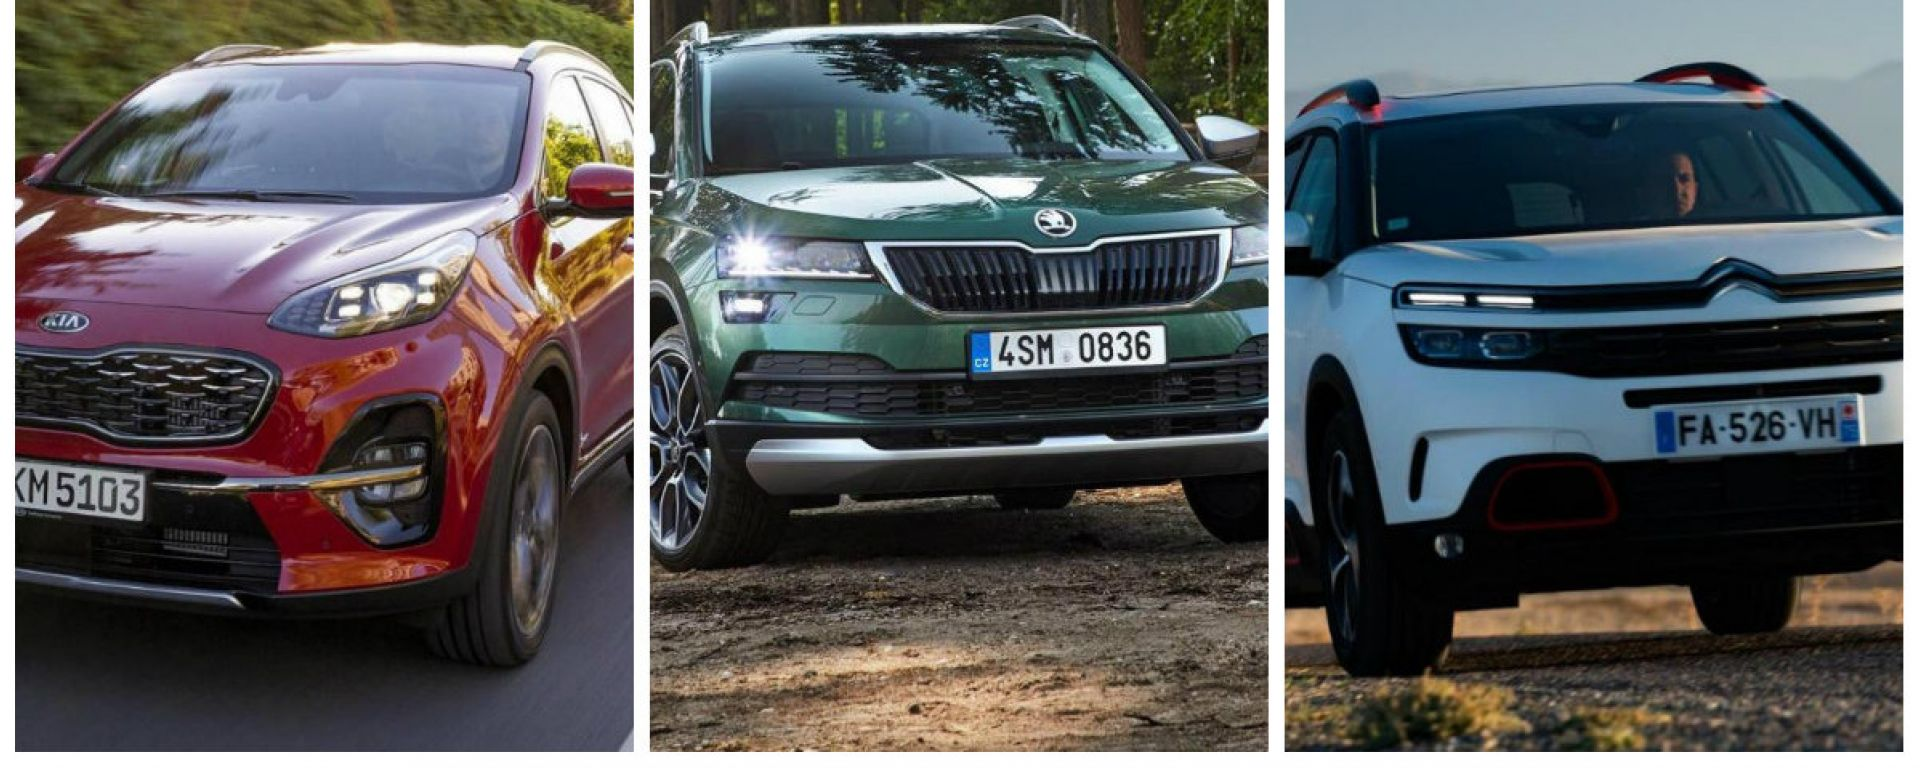 Kia Sportage, Skoda Karoq, Citroen C5 Aircross: quale scegliere?